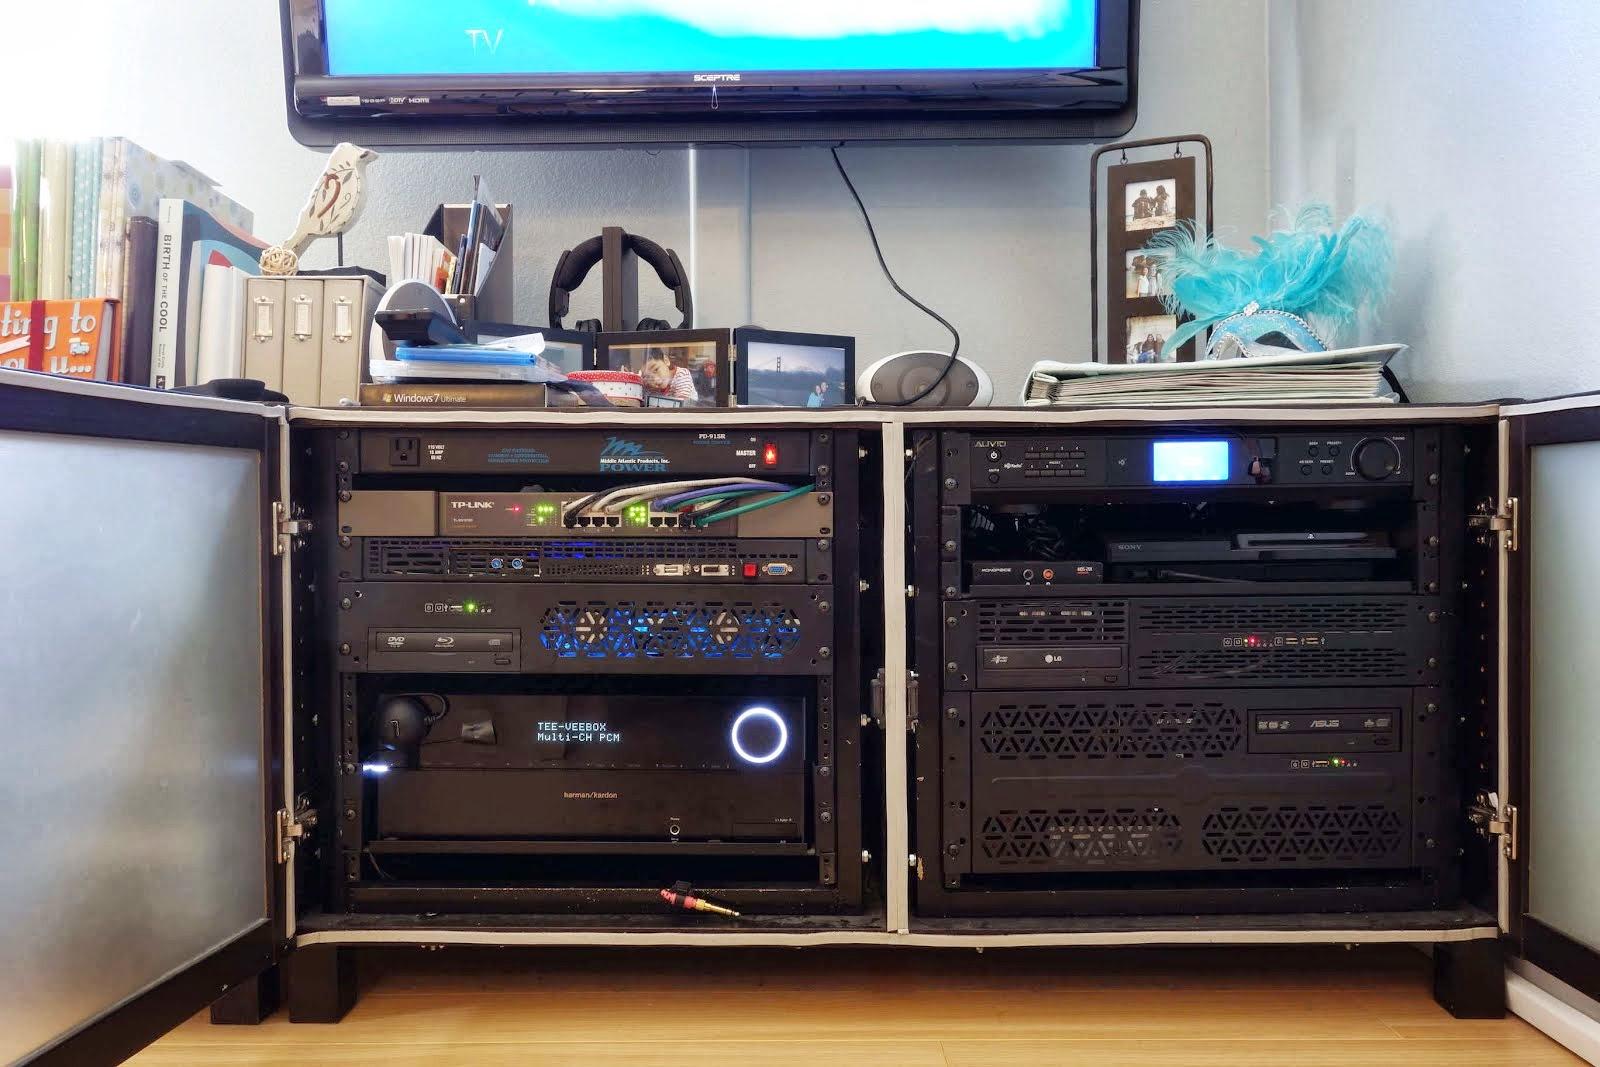 Benno Media Center Server Rack Ikea Hackers